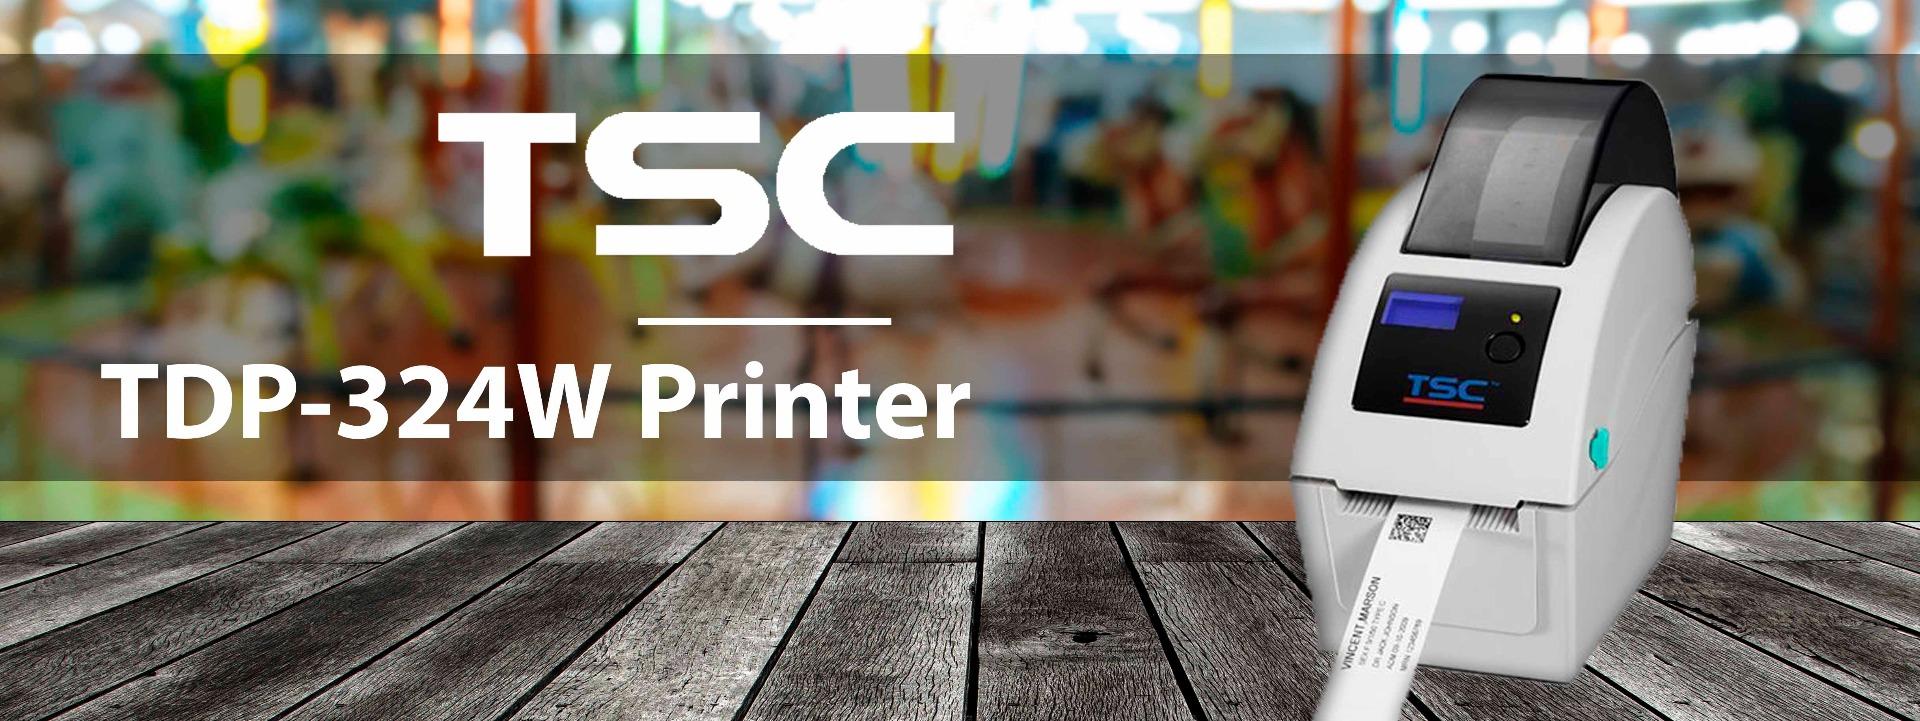 TSC TDP-324W Wristband Printer banner